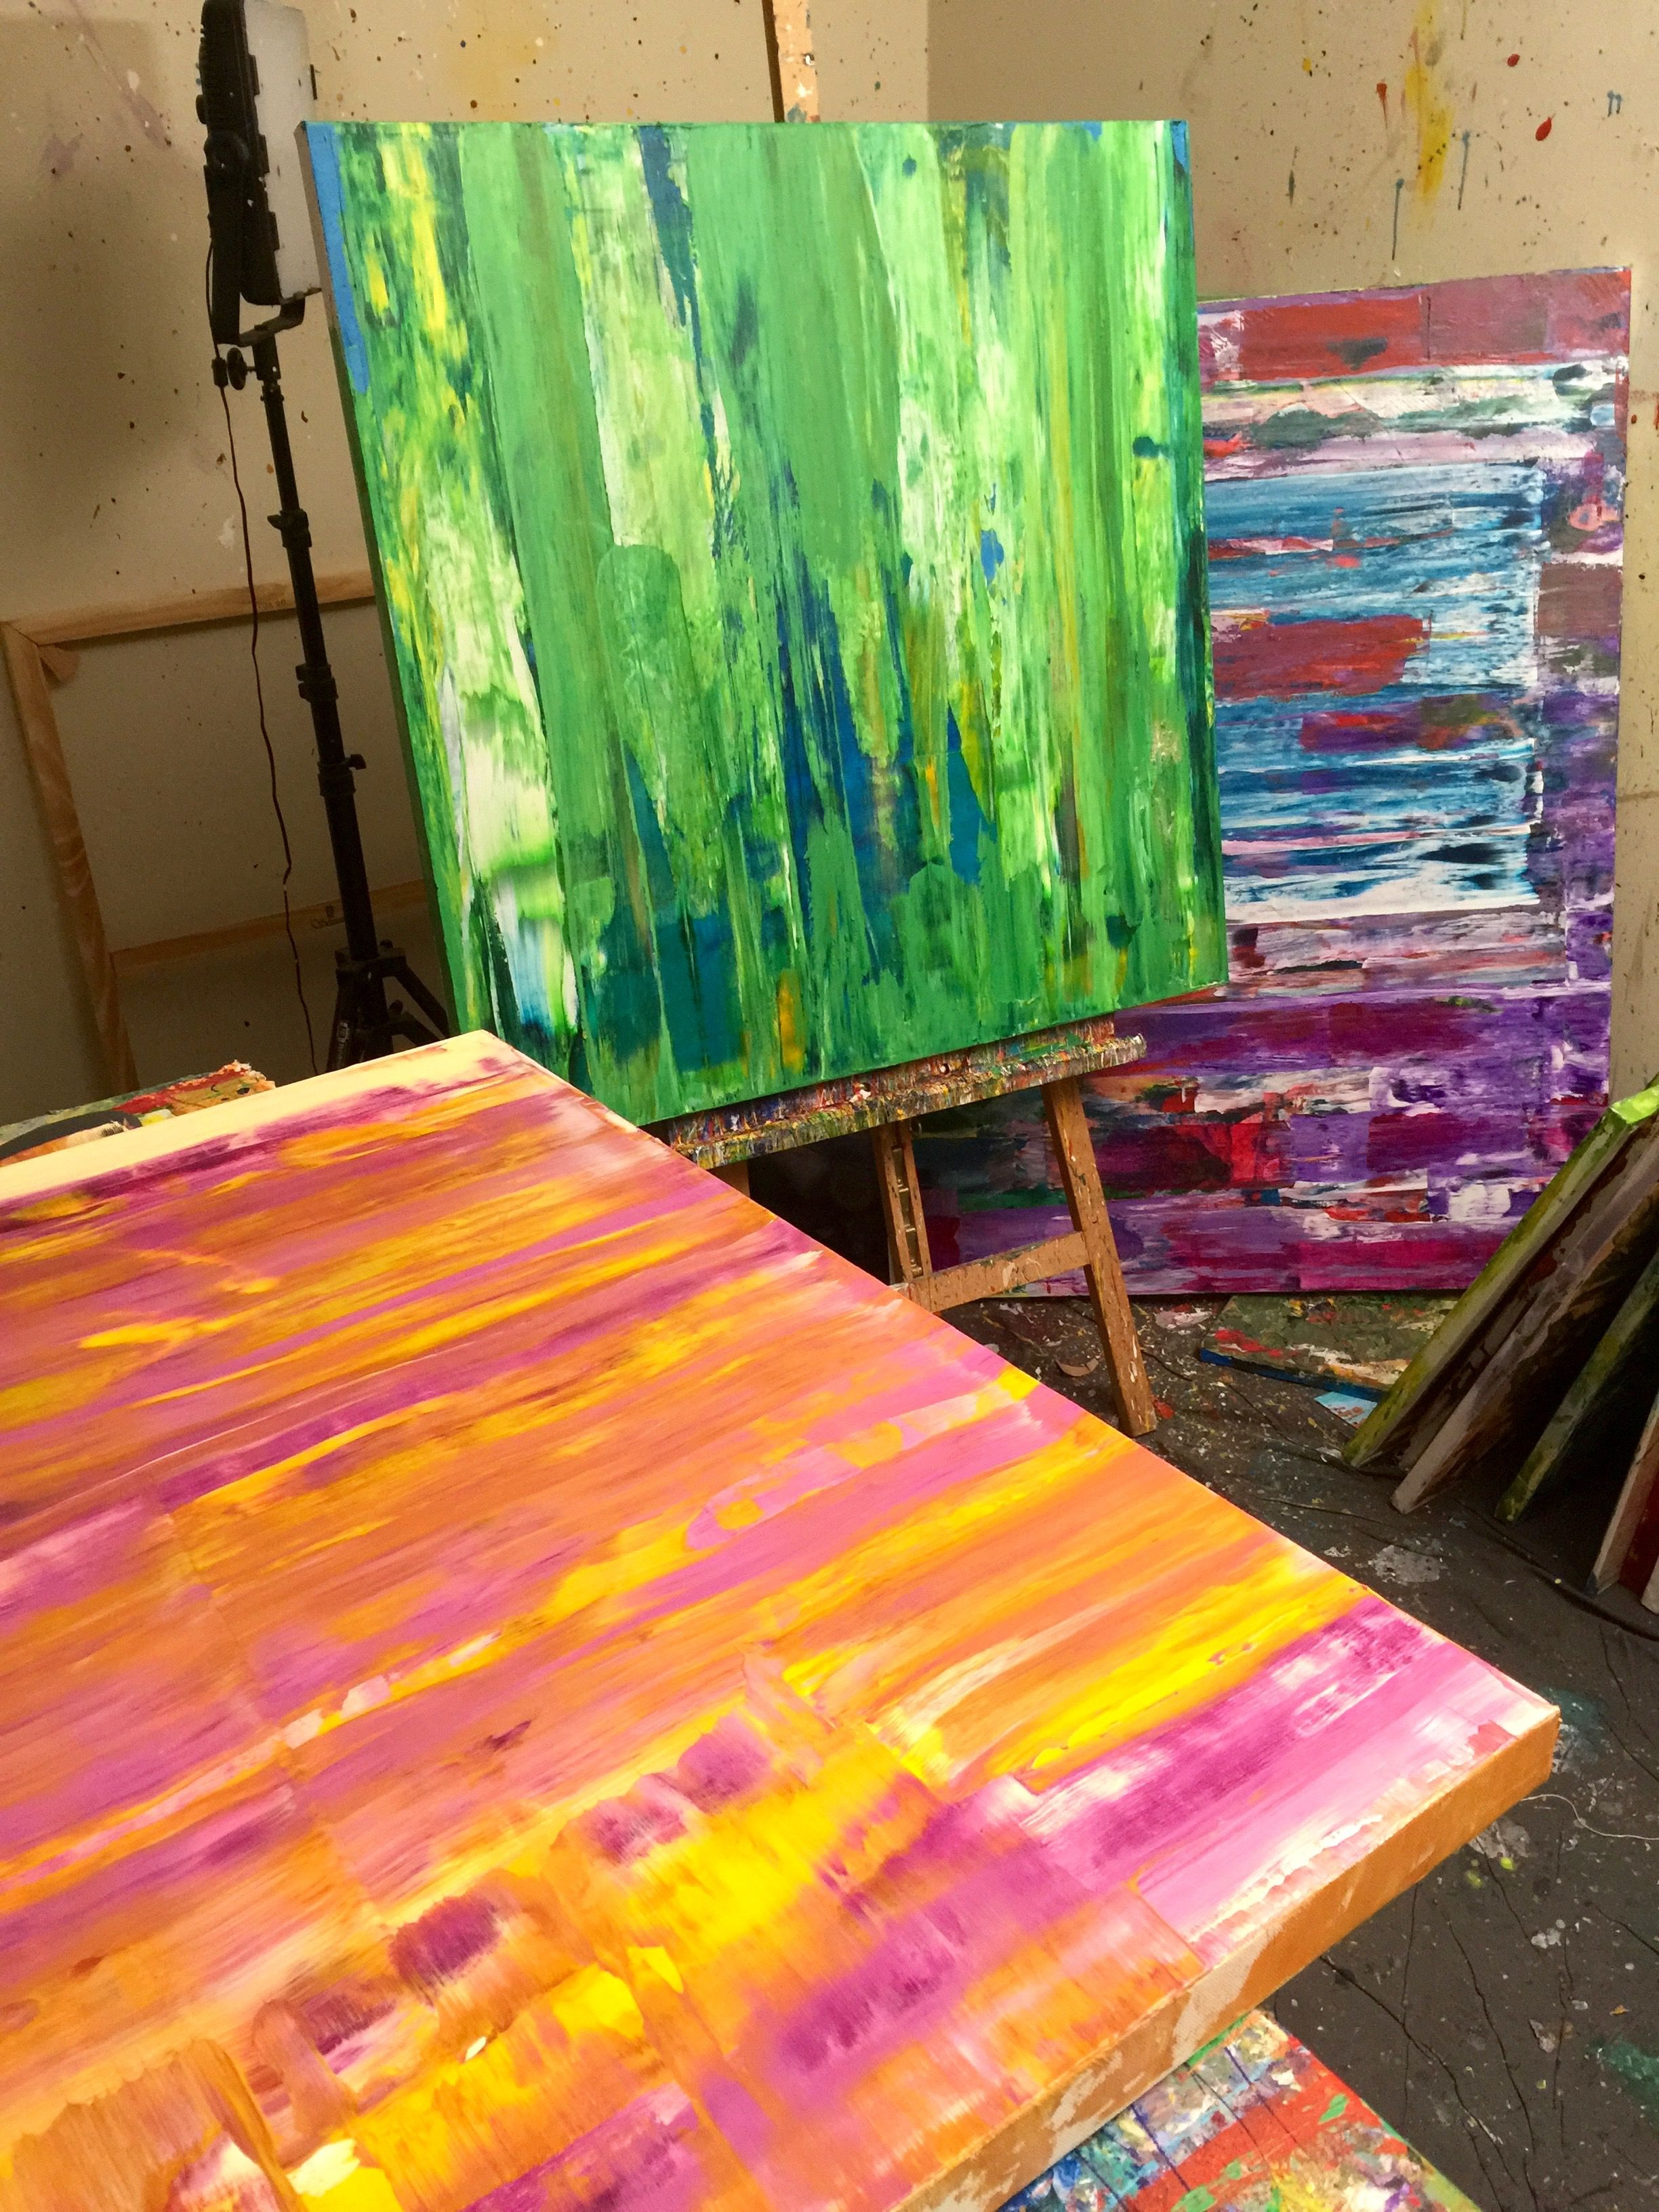 www.NestorToro.com Starting a new series #art #abstract #modern #expressionism #contemporary #LA #acrylics